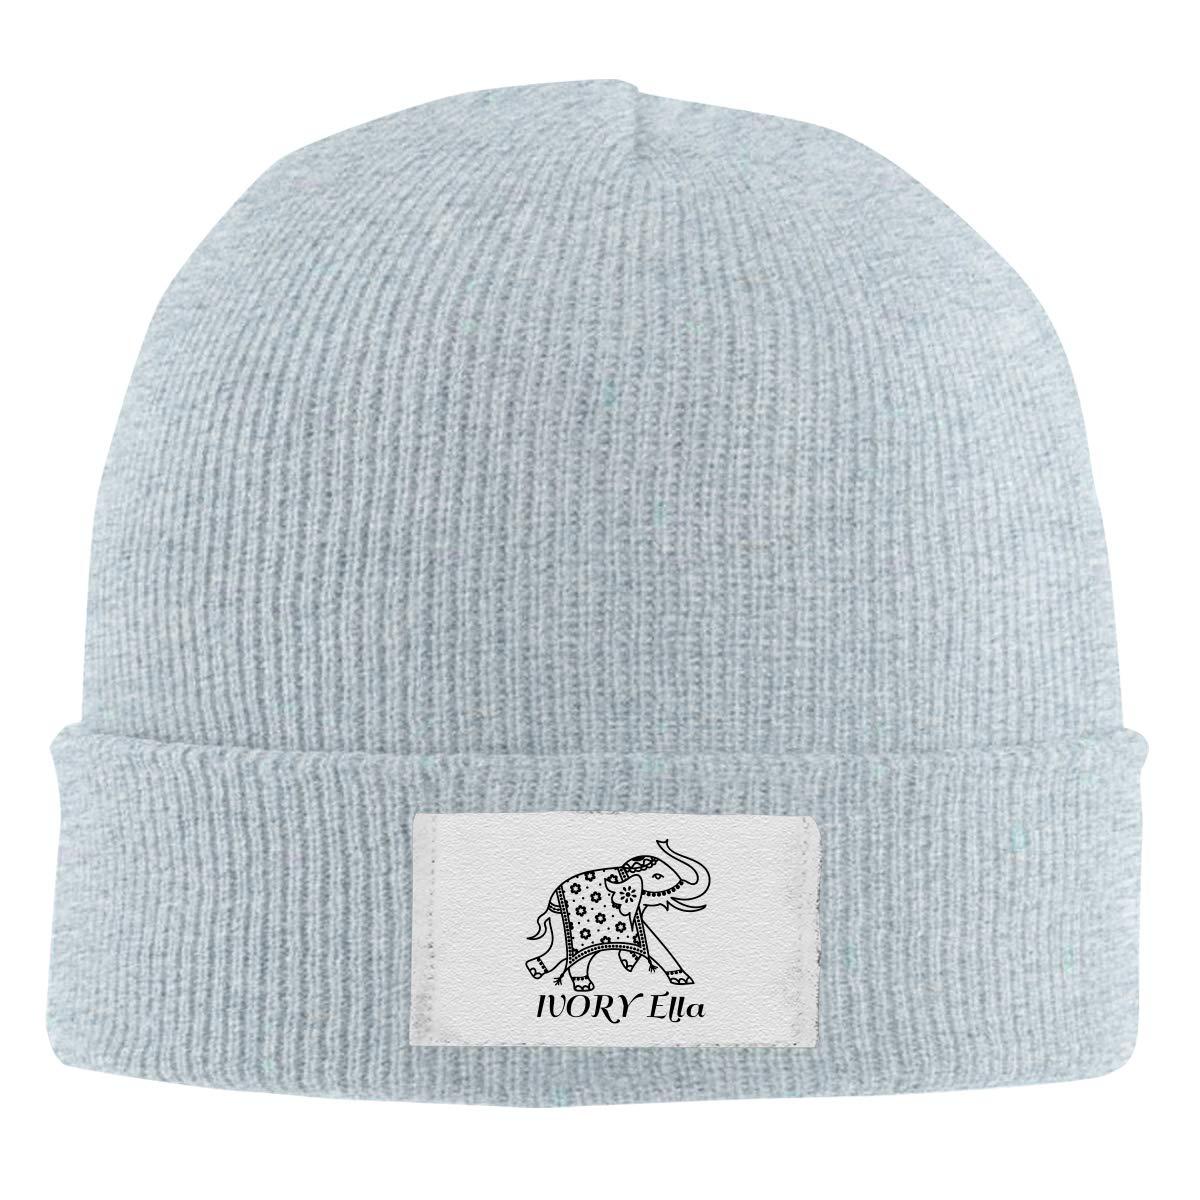 Skull Caps Cycling Shark Winter Warm Knit Hats Stretchy Cuff Beanie Hat Black